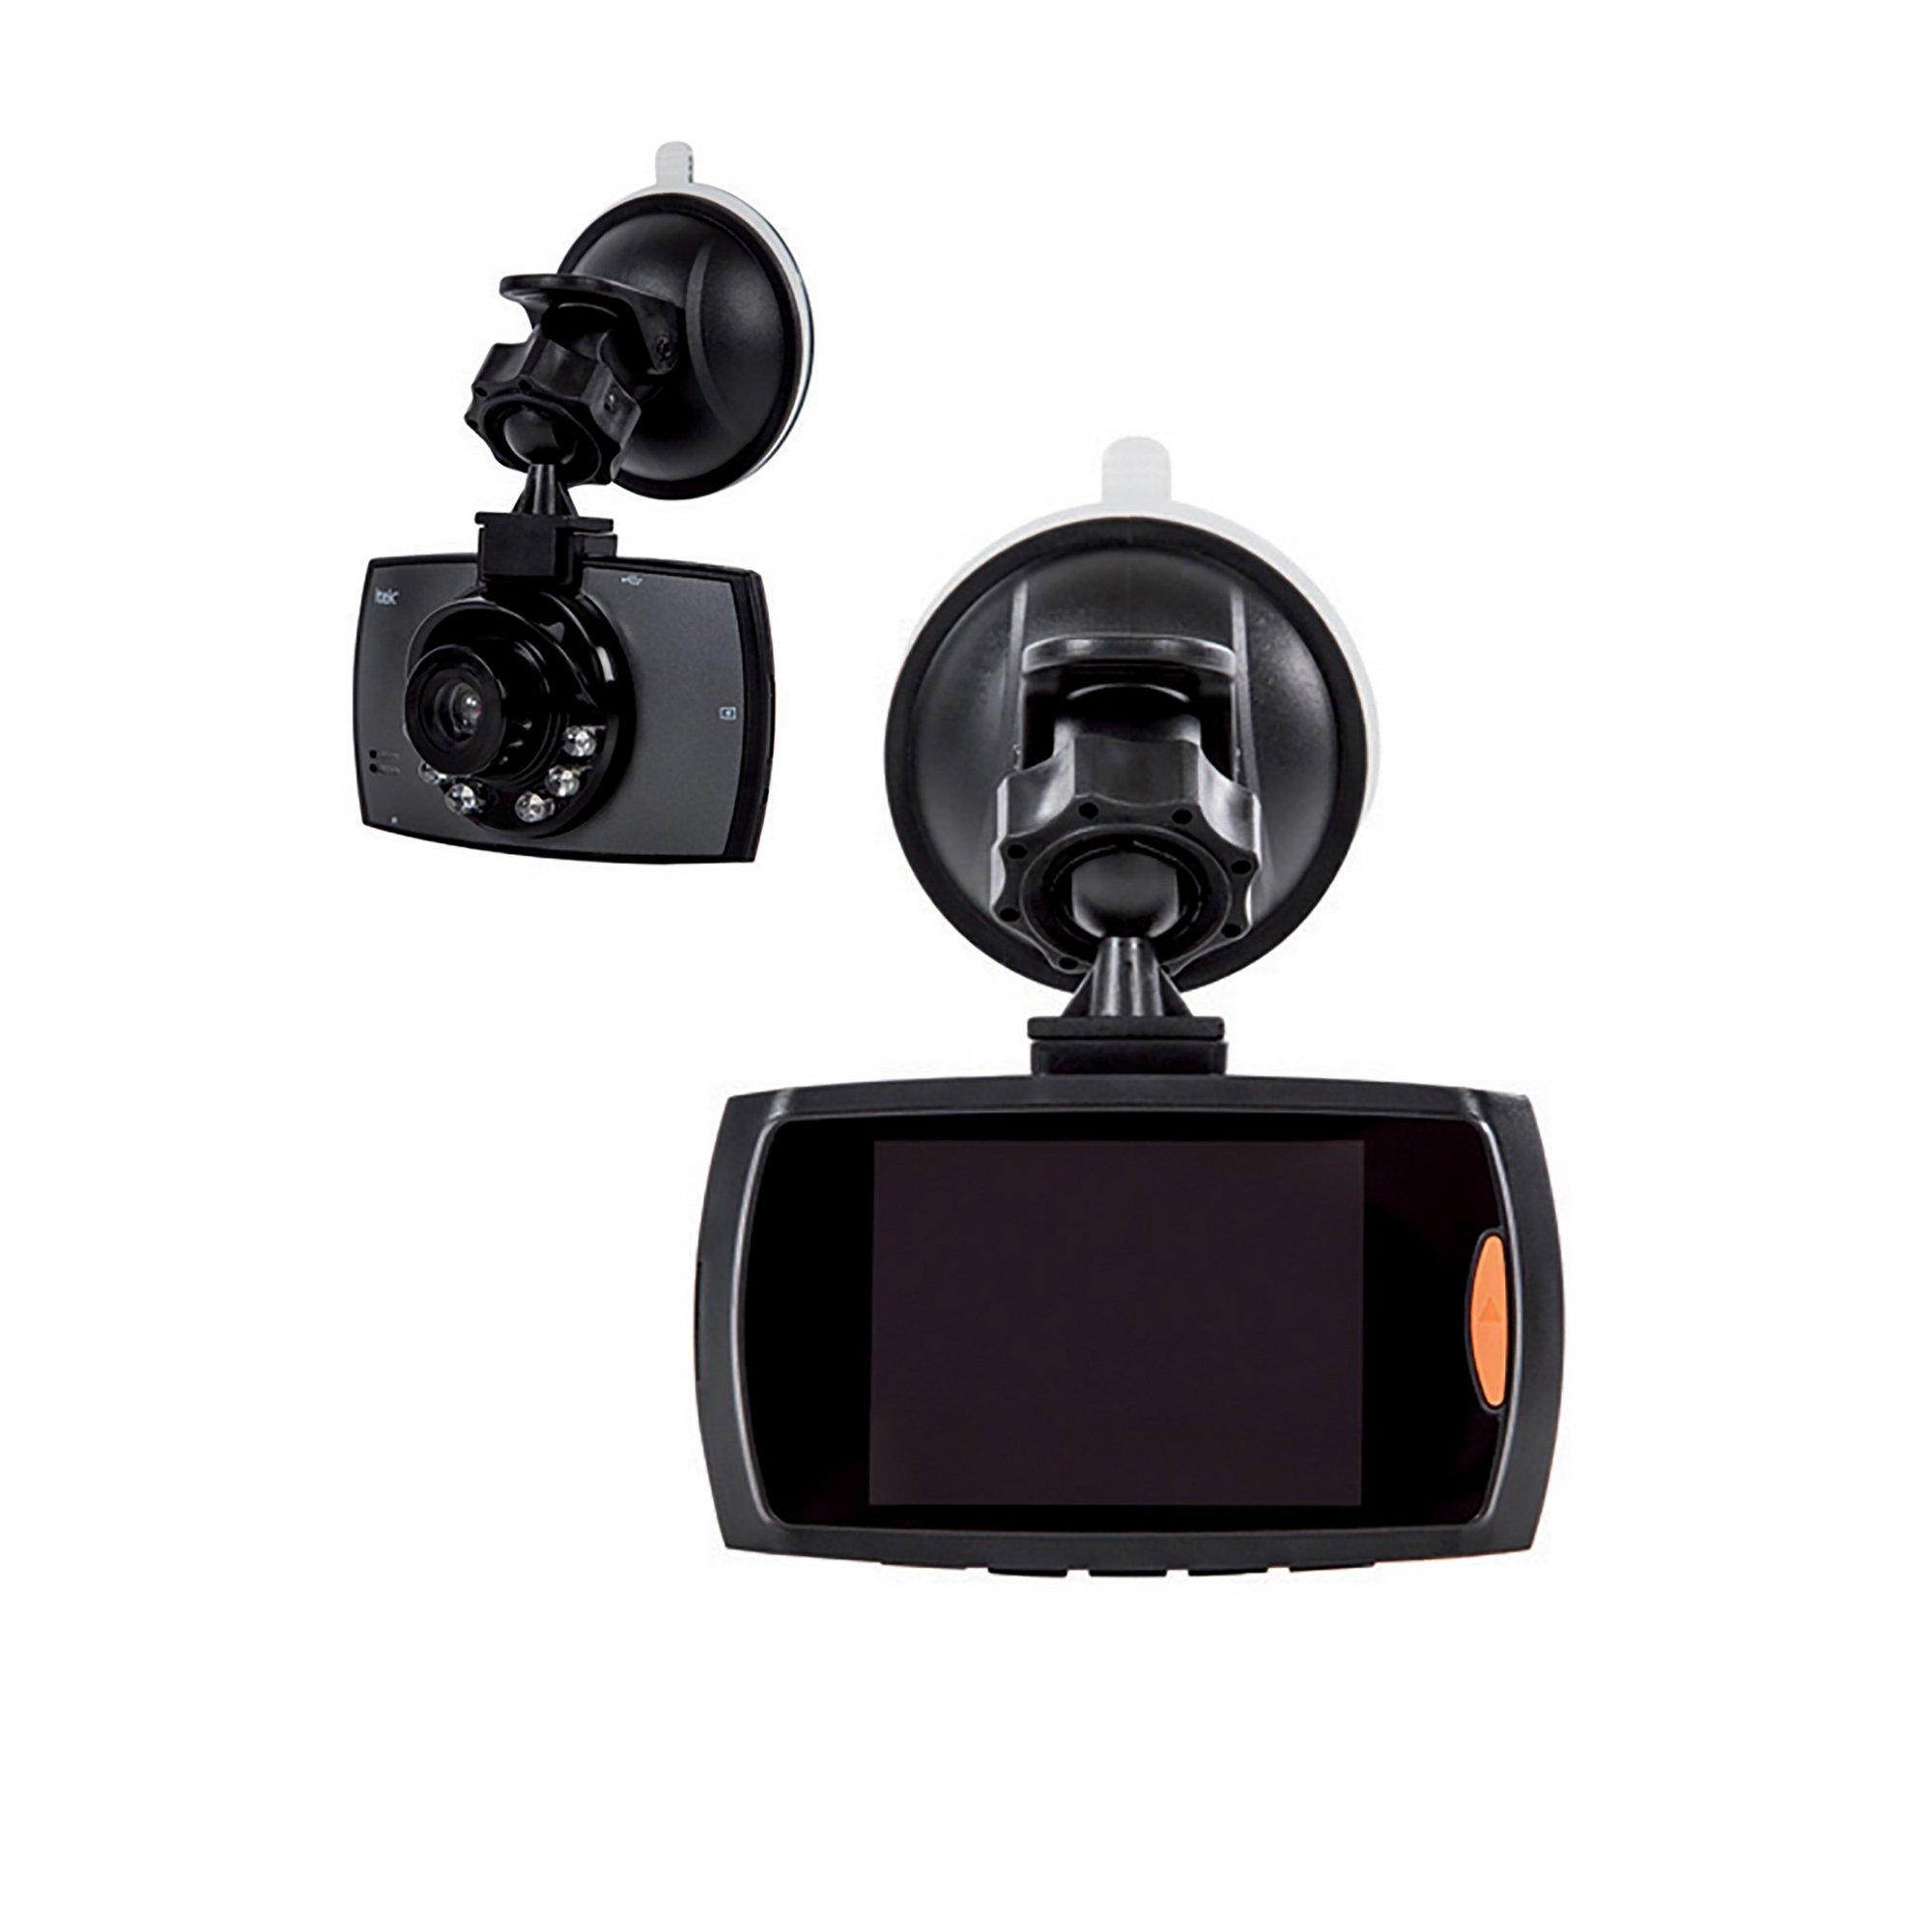 Image of iTek Slimline Dash Cam